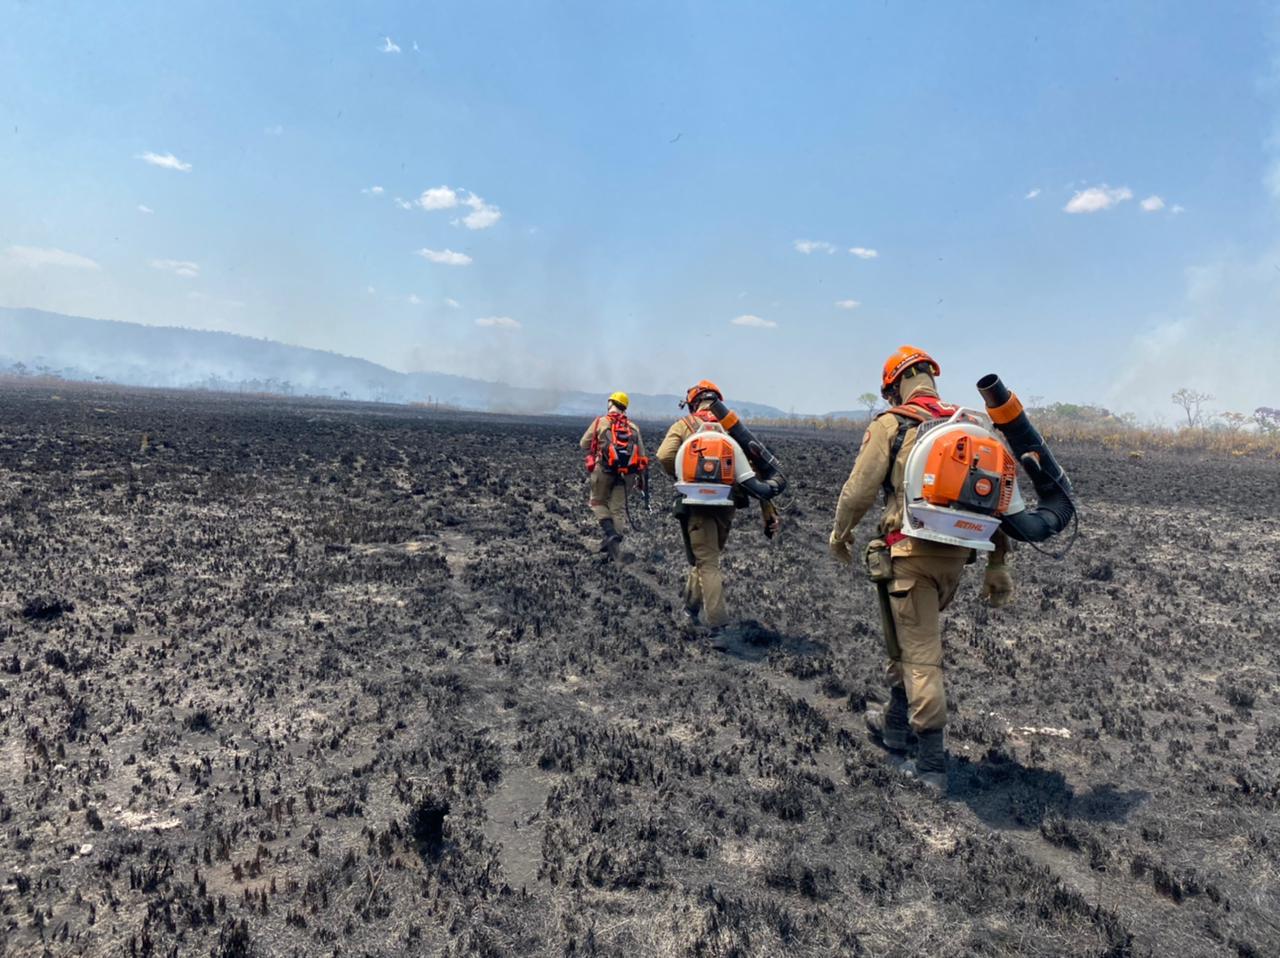 Incêndio na Chapada dura sete dias e já consumiu 14 hectares de mata